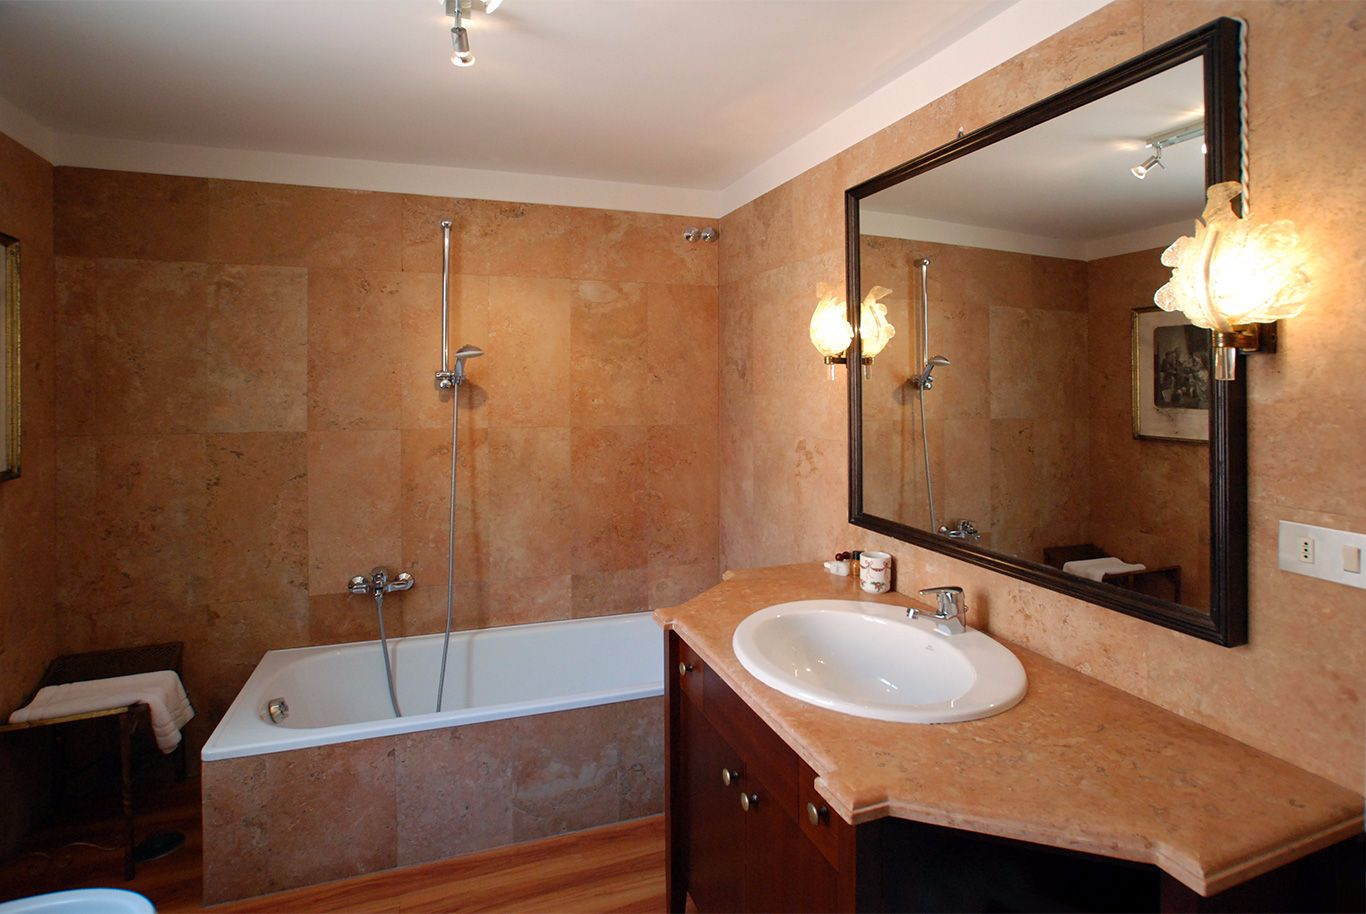 en-suite bathroom of the master bedroom